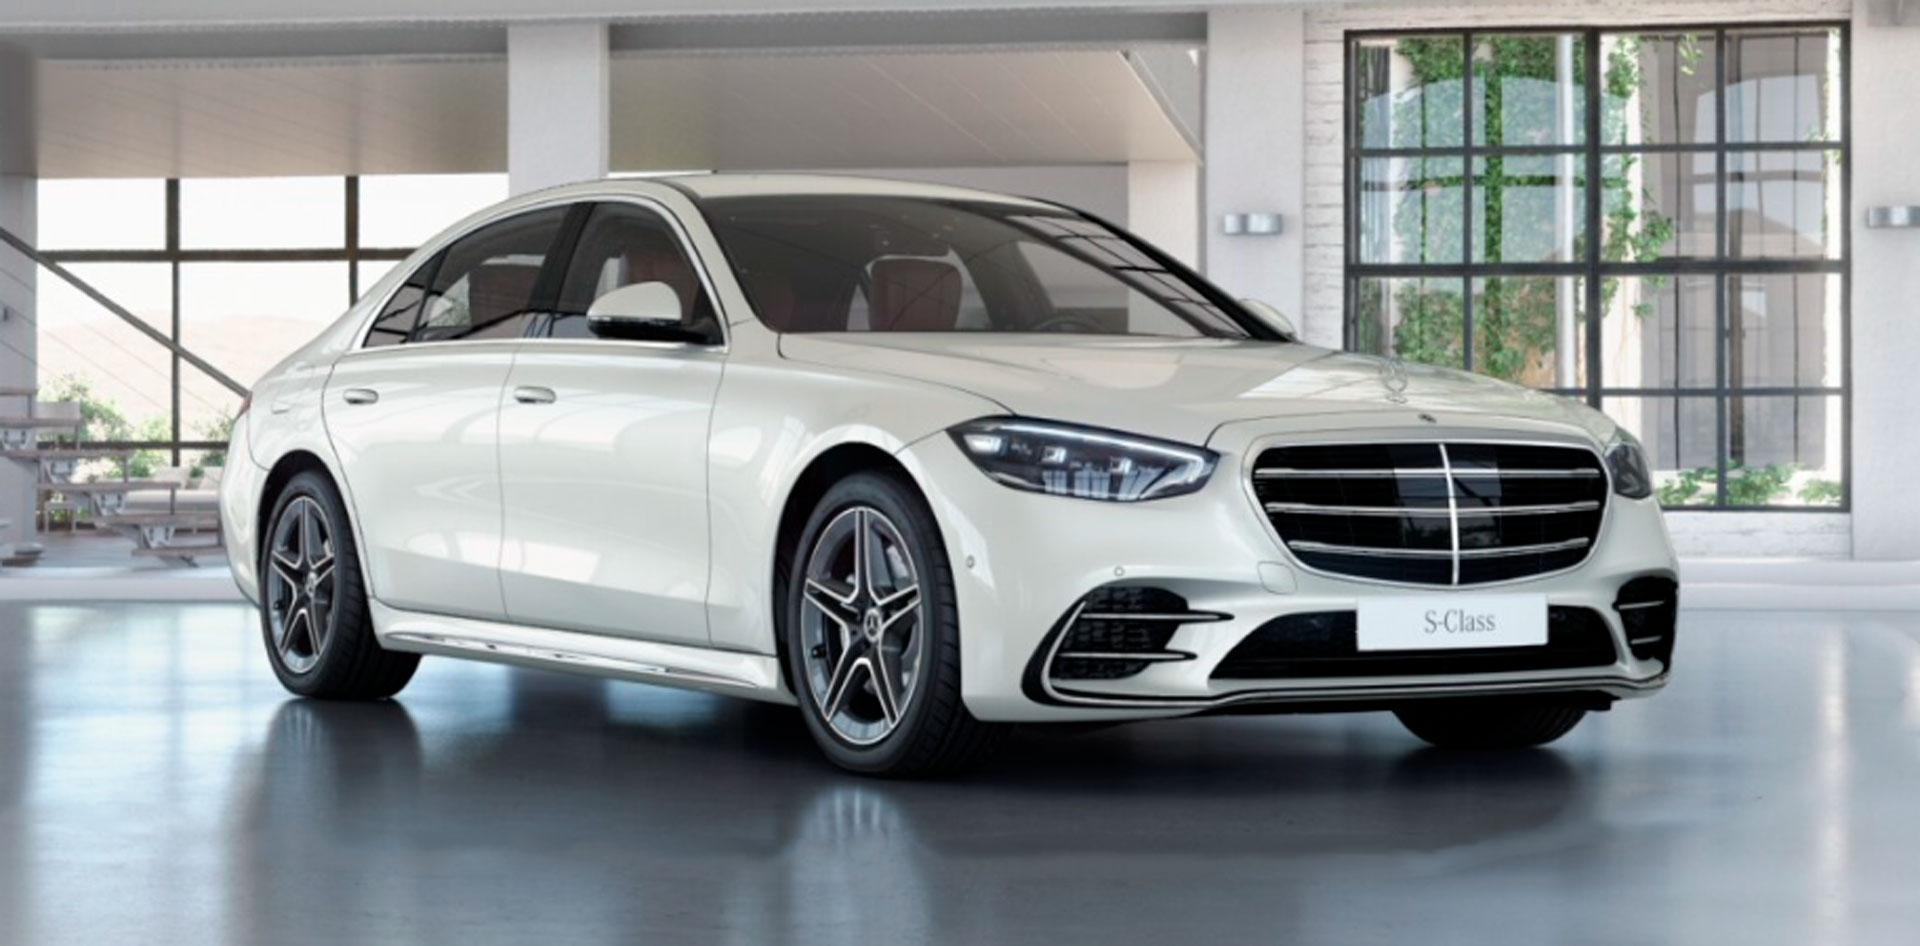 Mercedes-Benz S-Class Limousine 0152606087